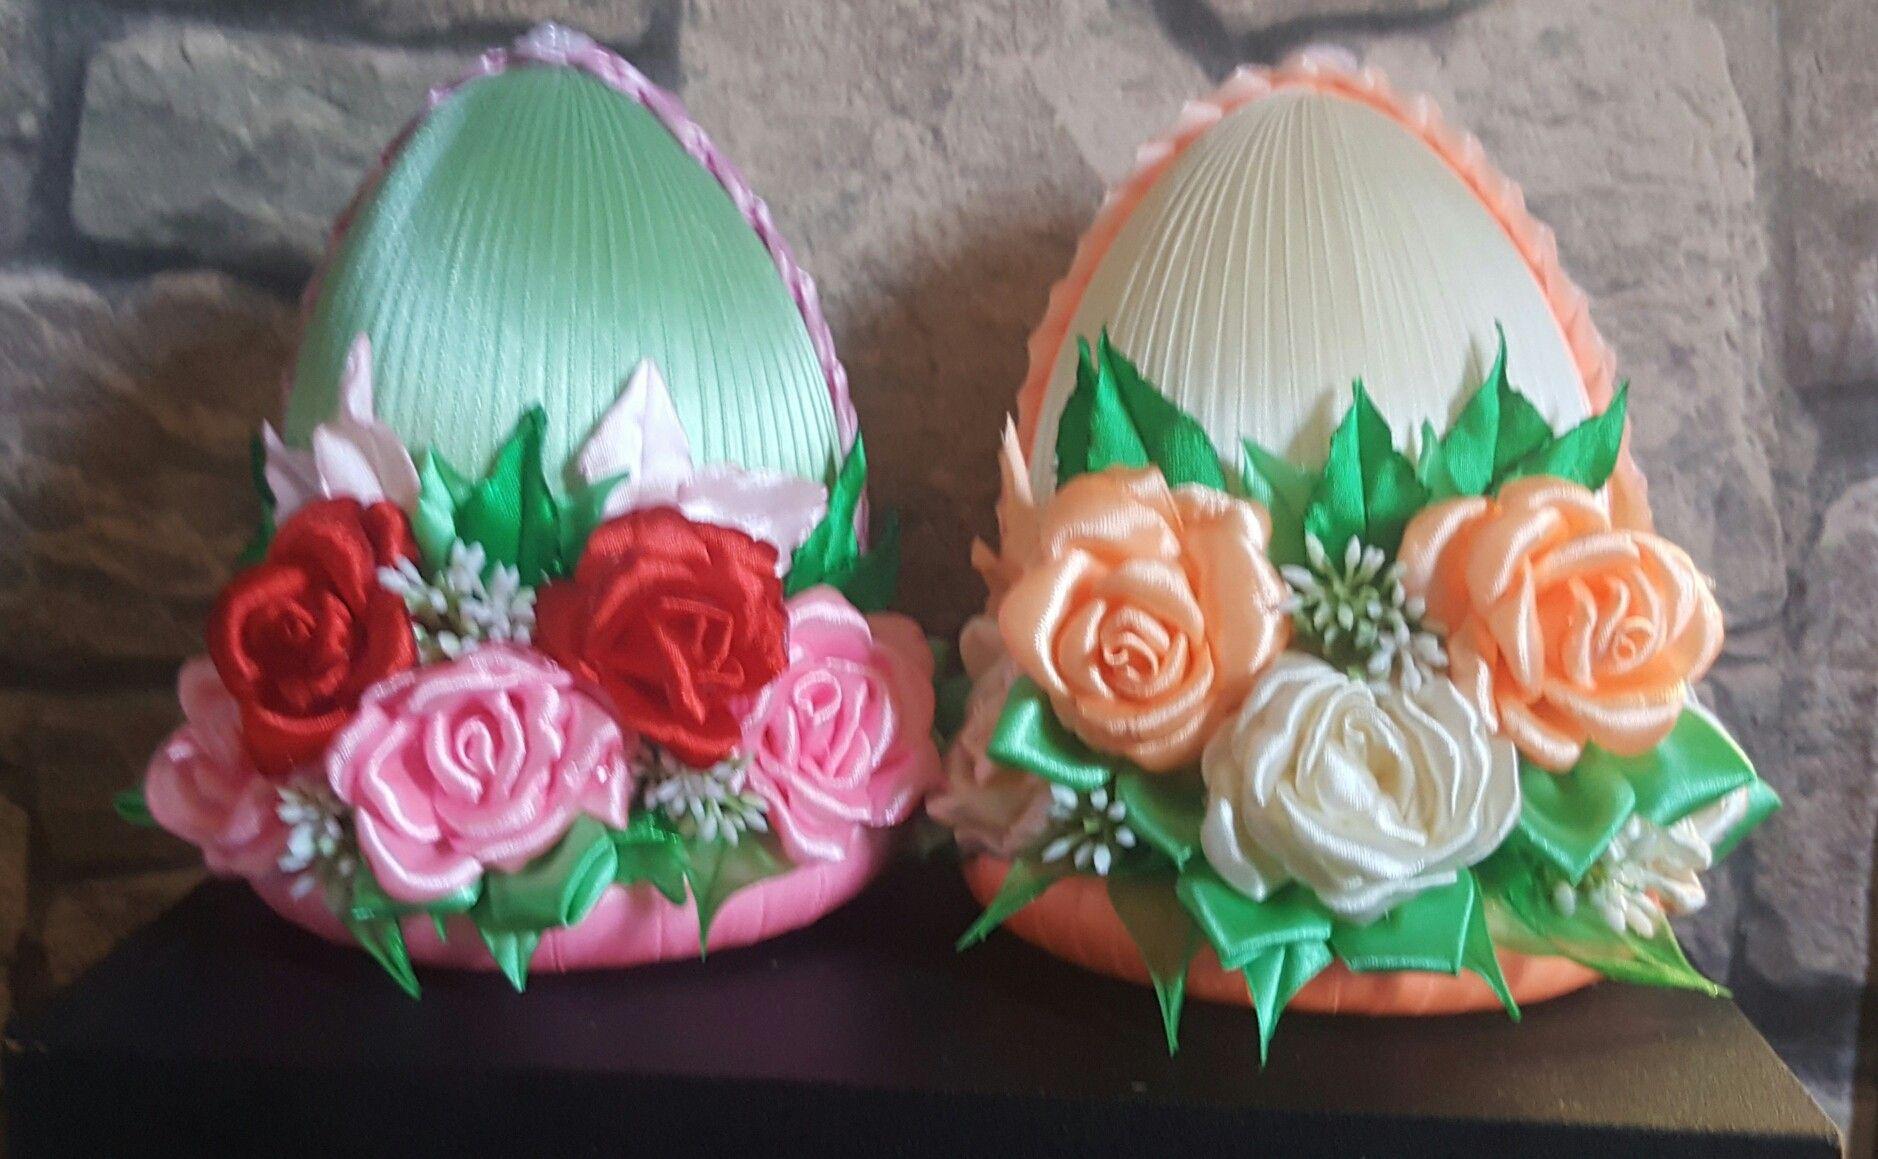 Pin By Iwona Majchrzak On Veľka Noc Easter Projects Crafts Egg Art